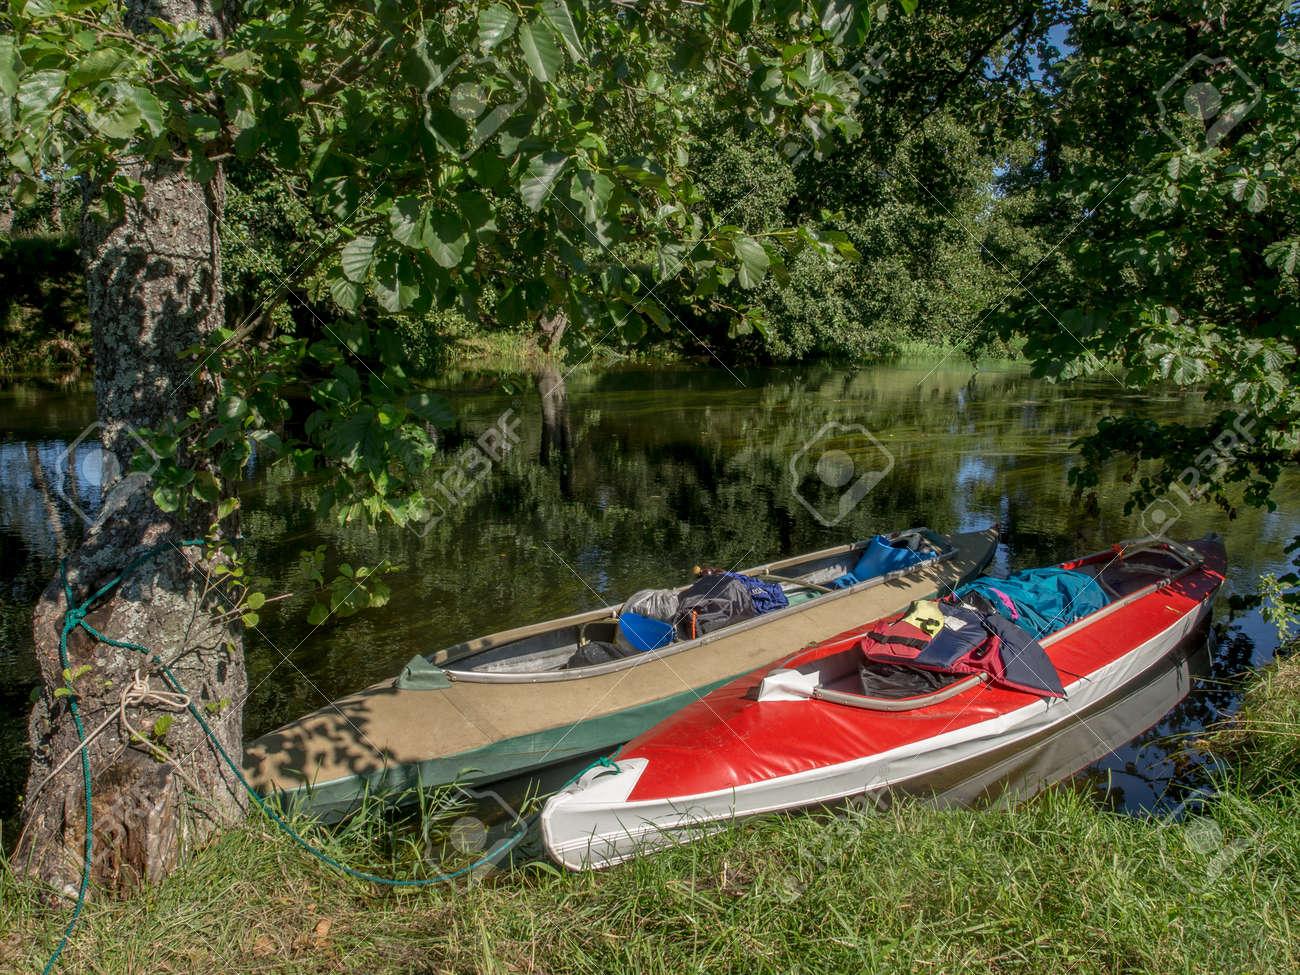 Folding kayaks at a bank of a the river Wda